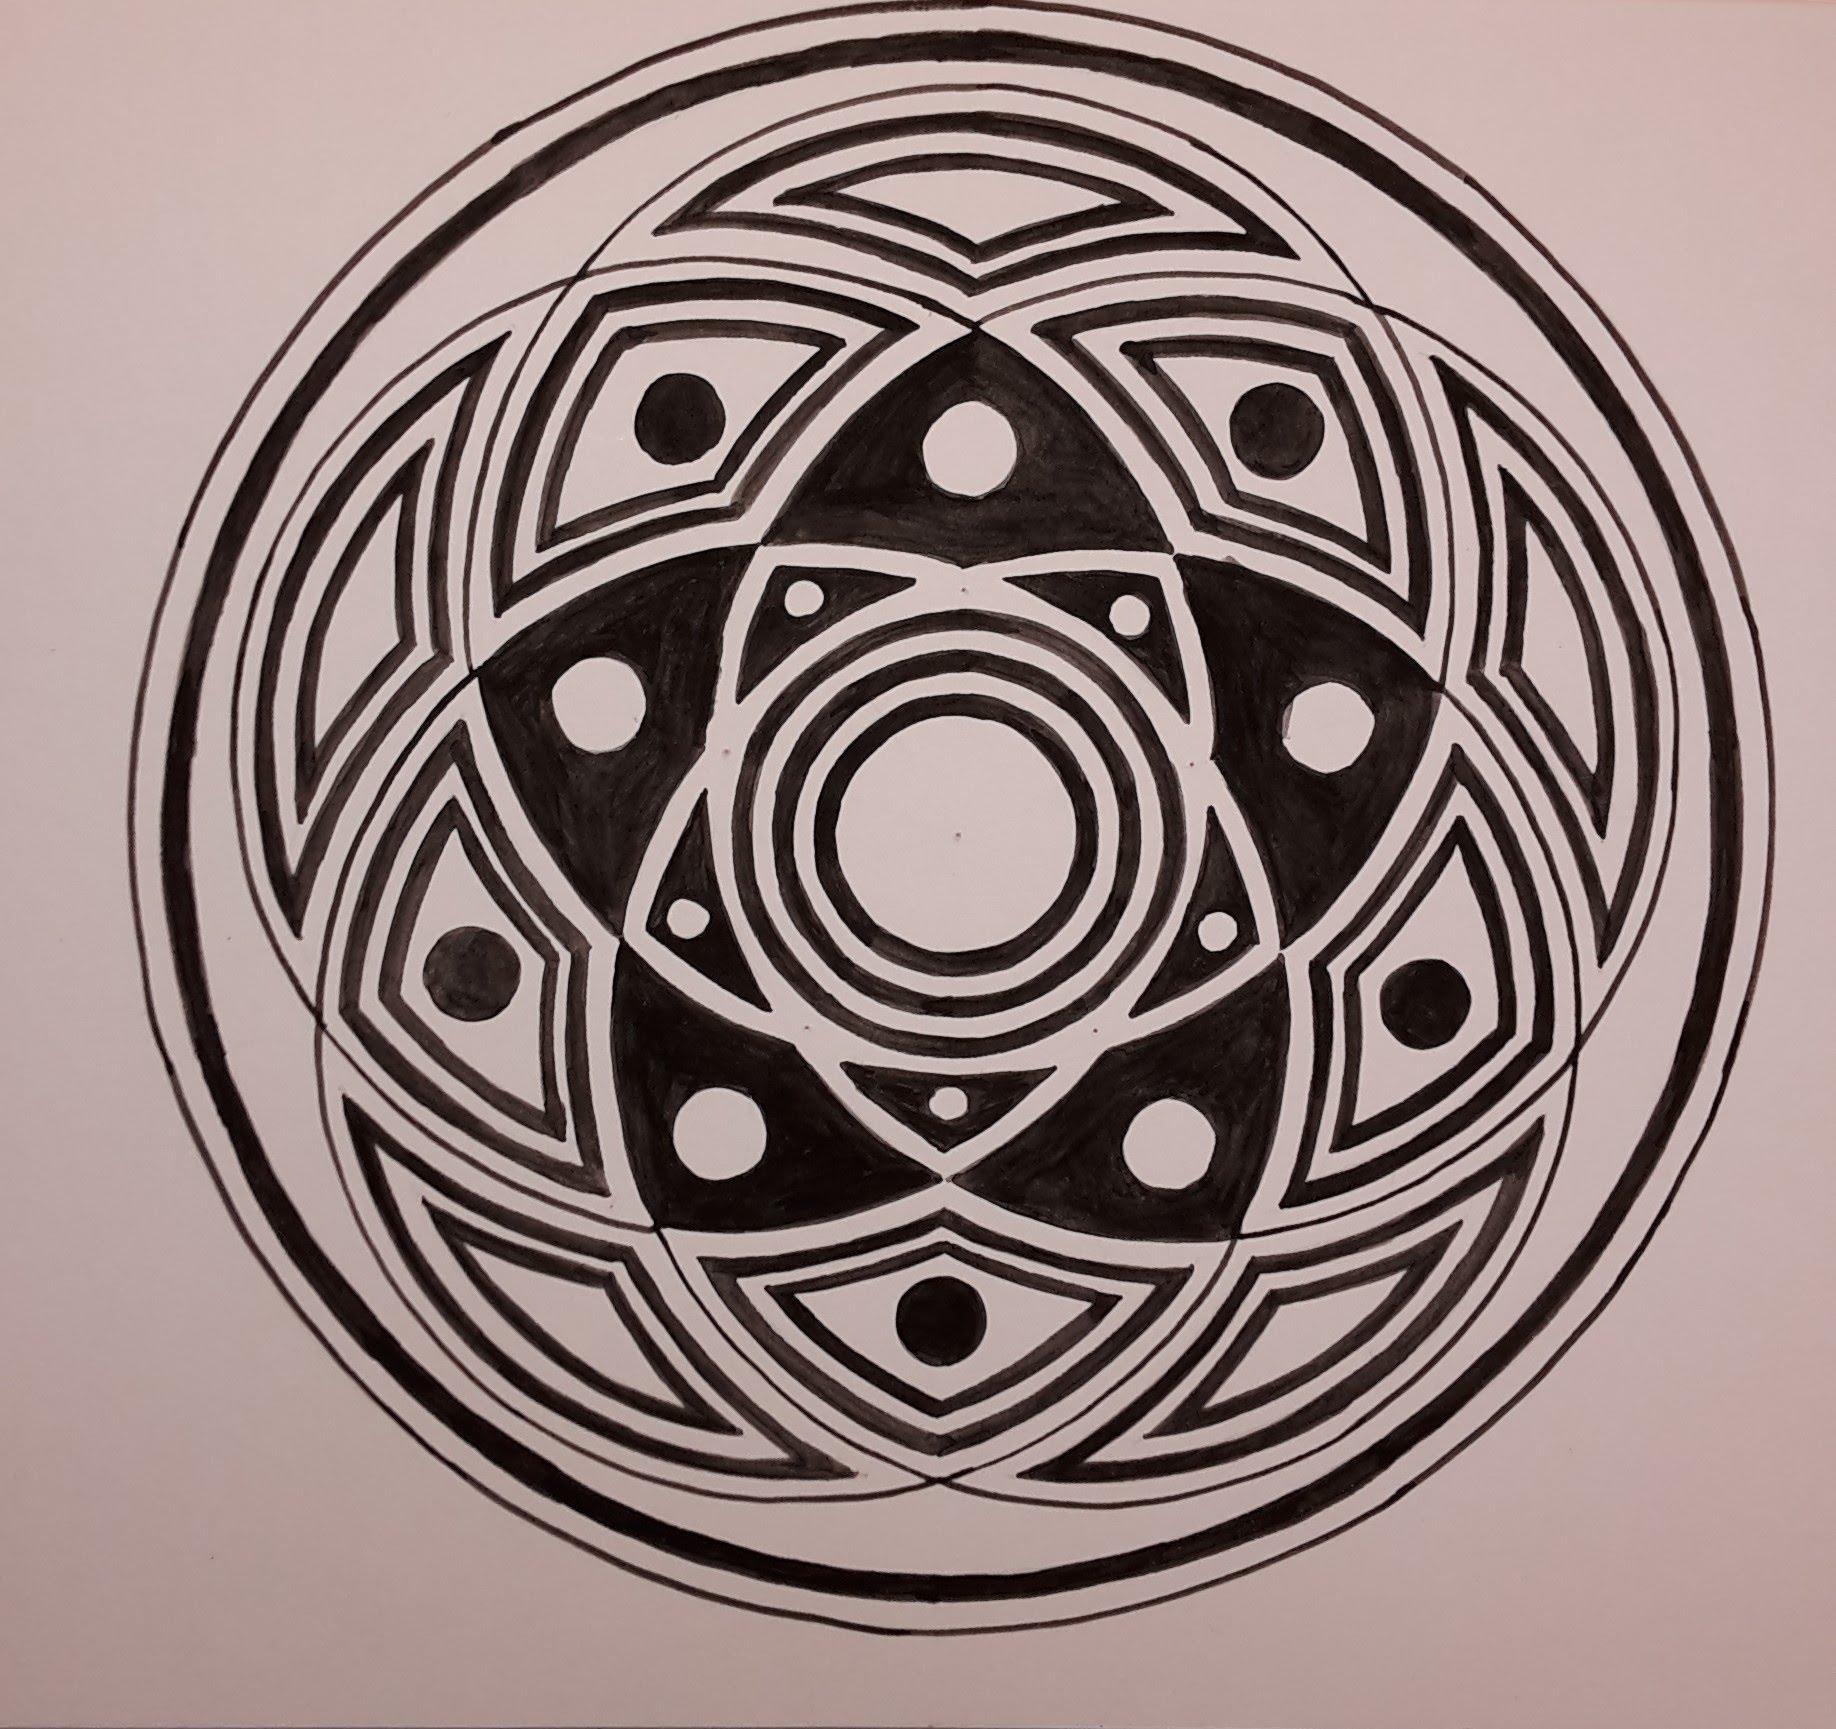 1836x1729 5 Circles In Harmony Geometric Design